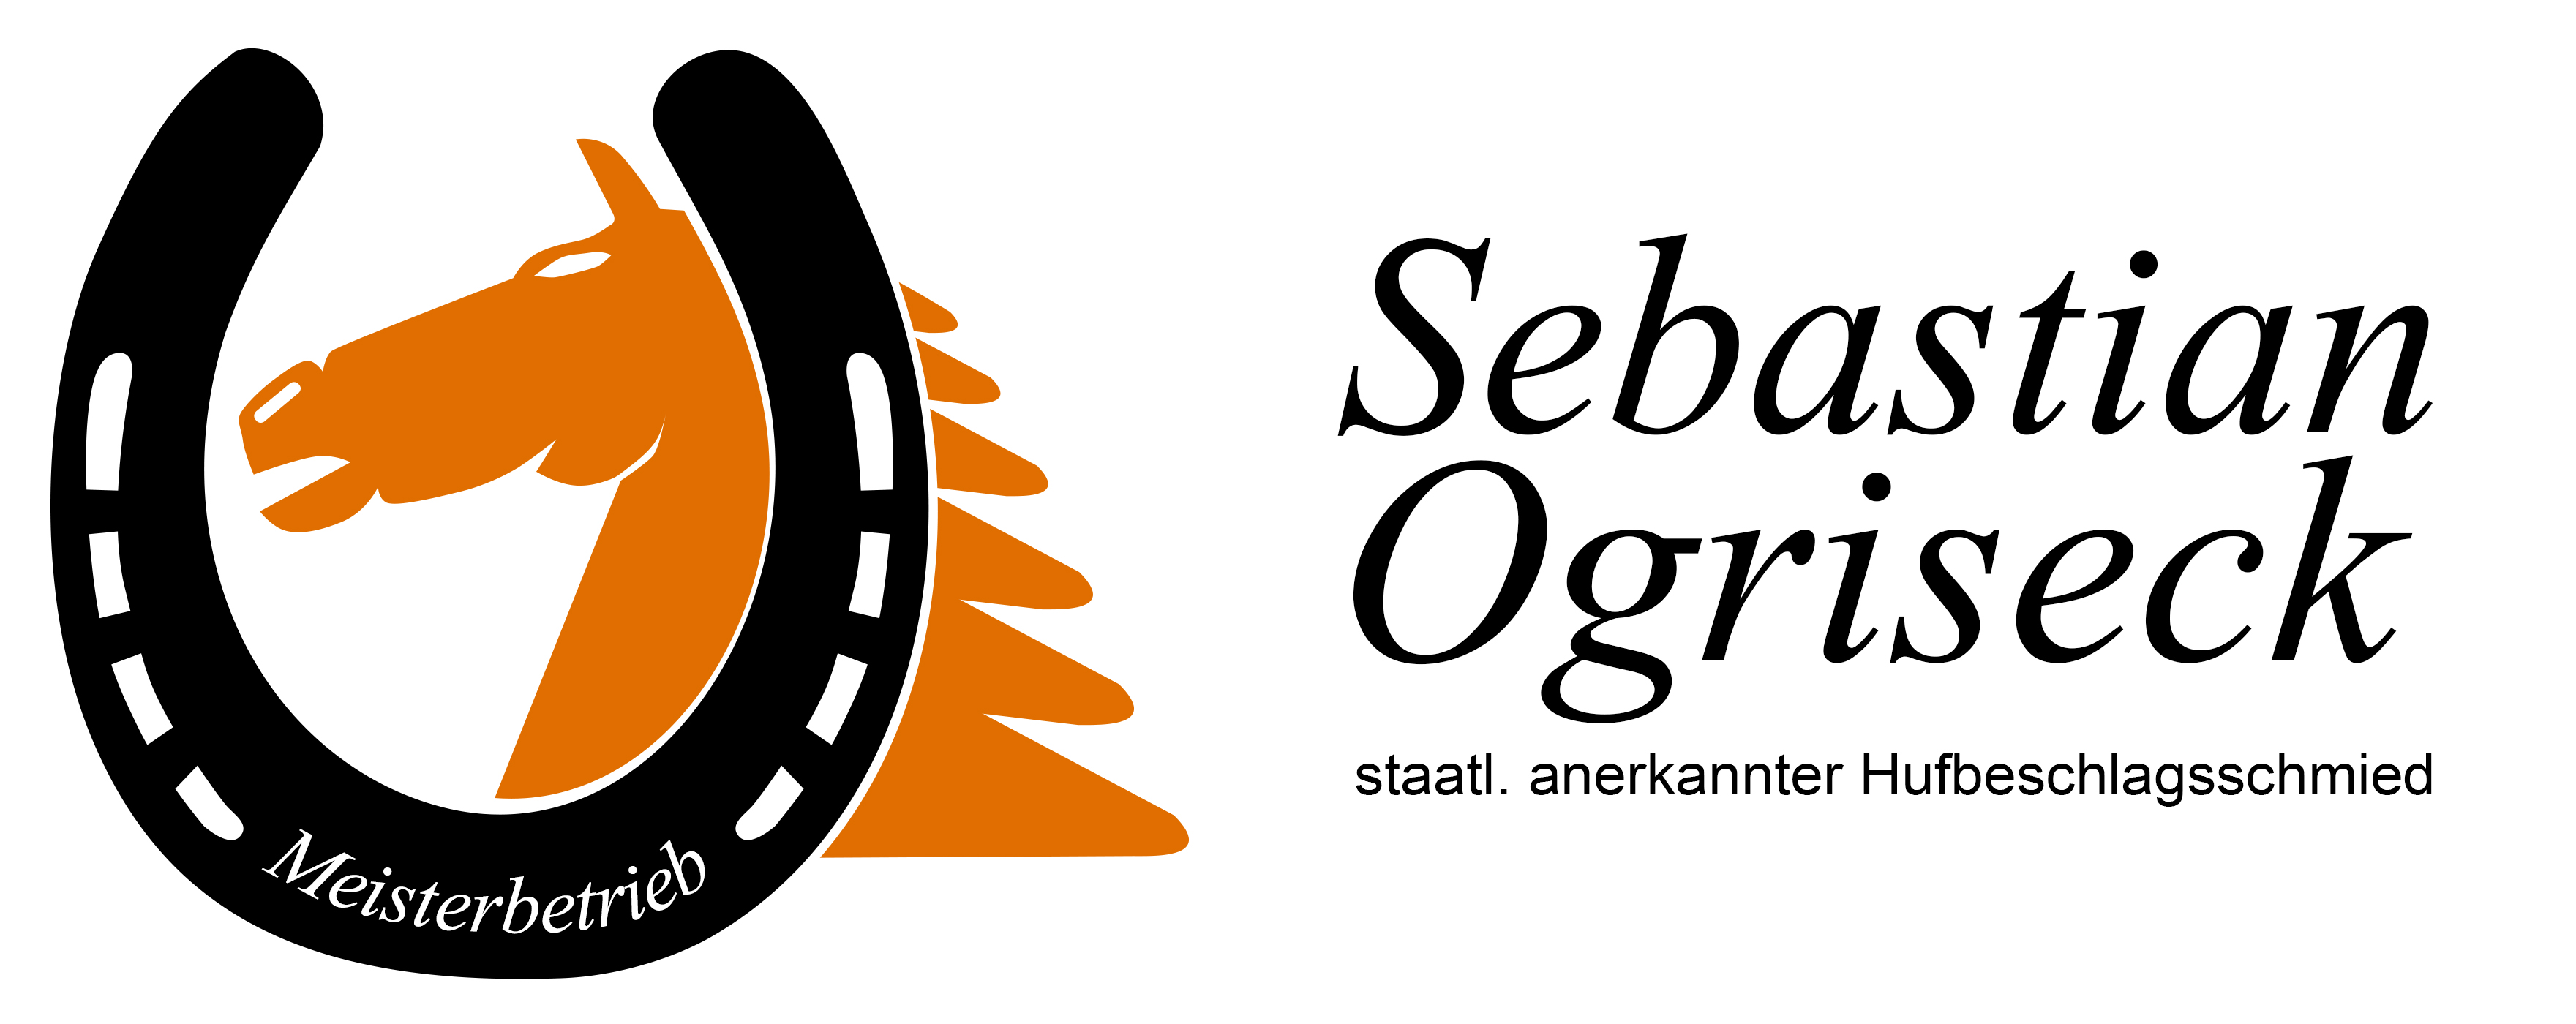 Sebastian Ogriseck